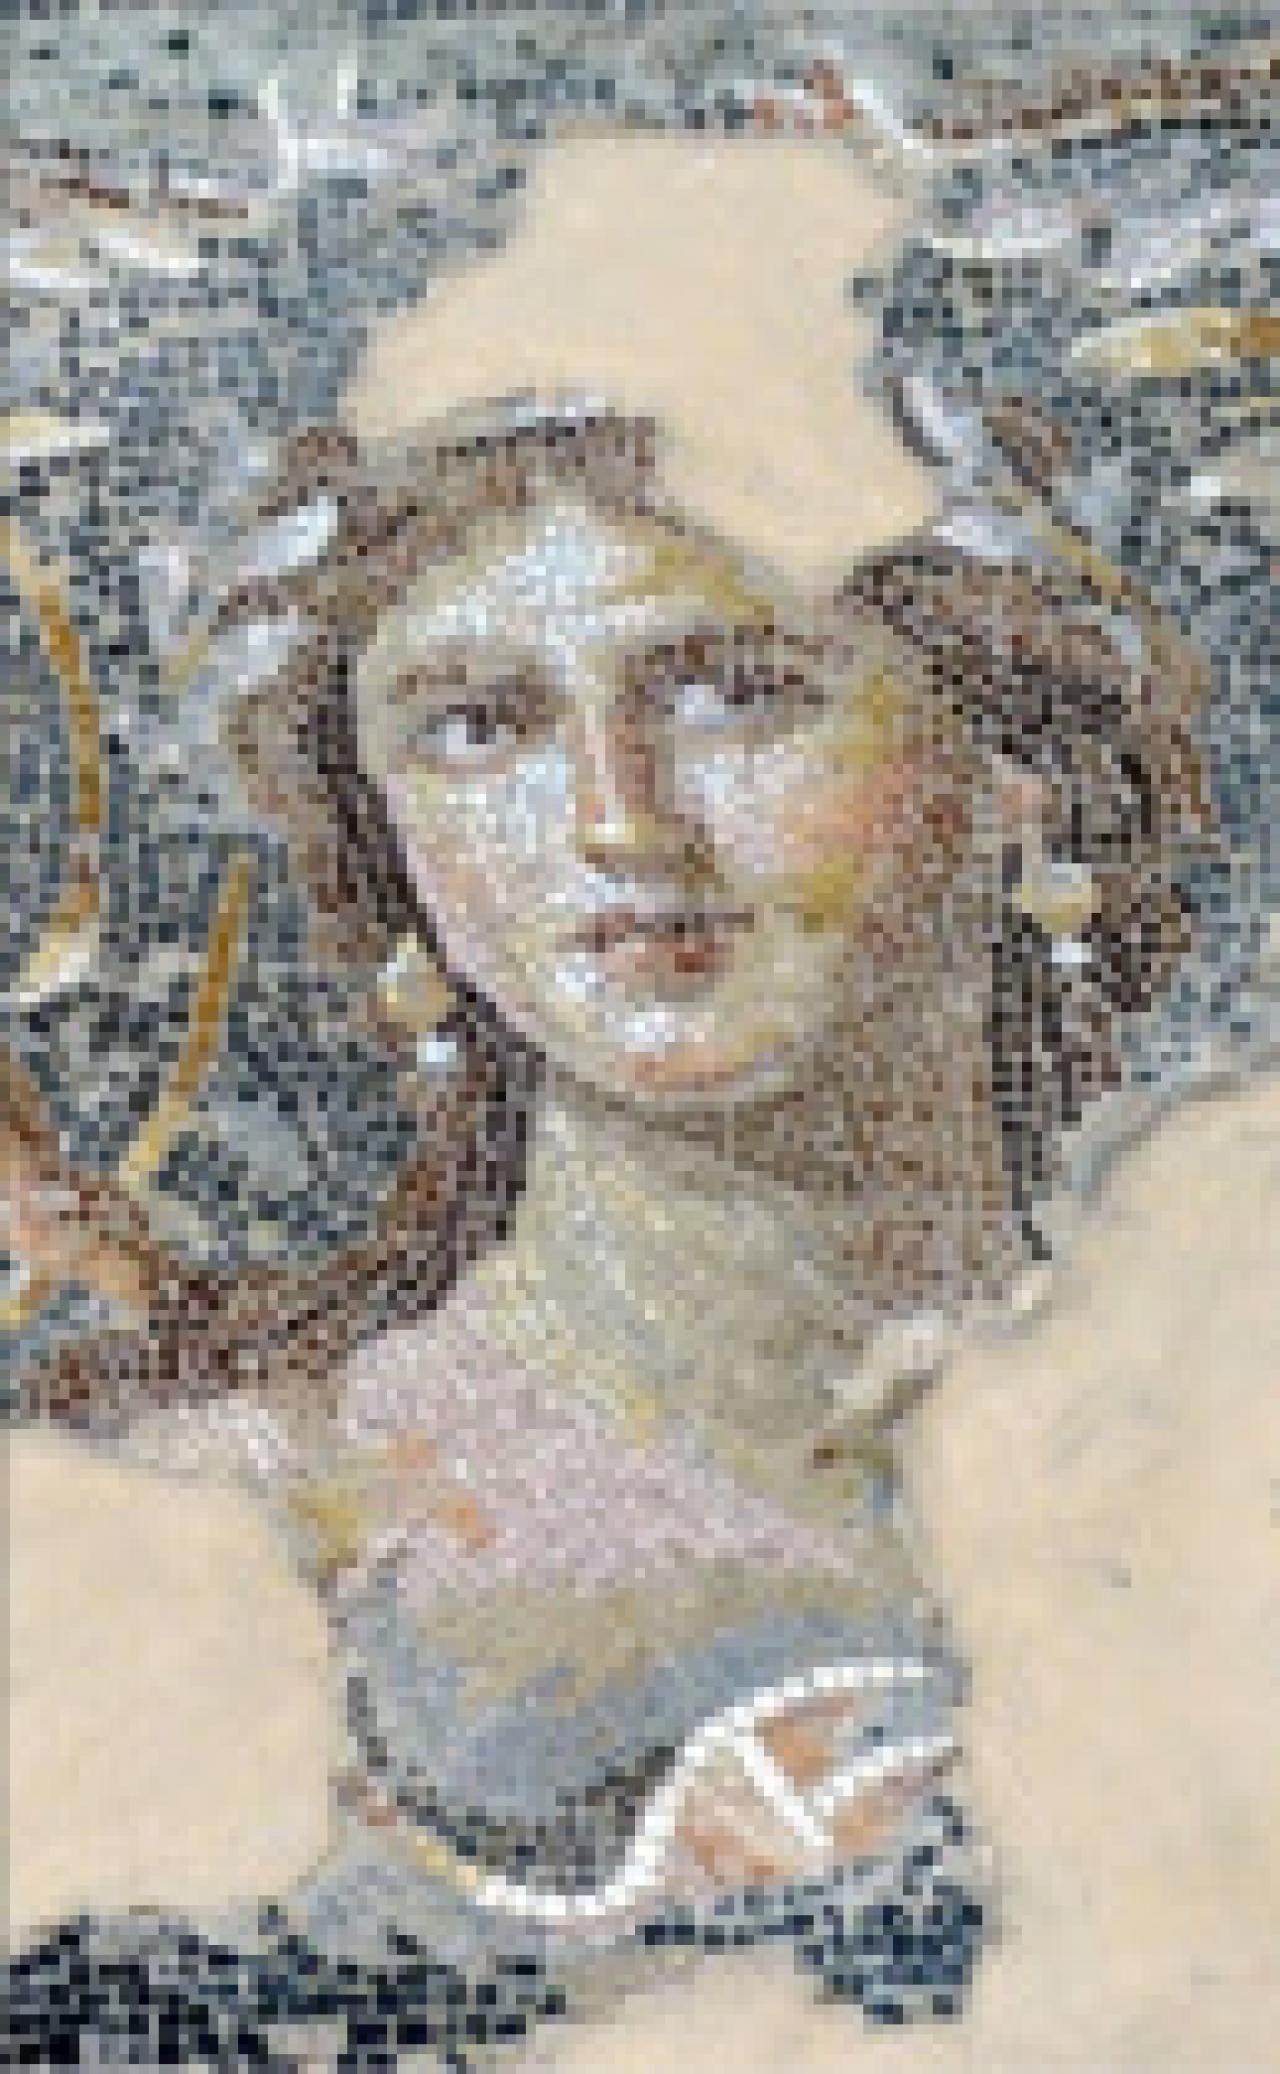 Mona Lisa of the Galilee at Zippori